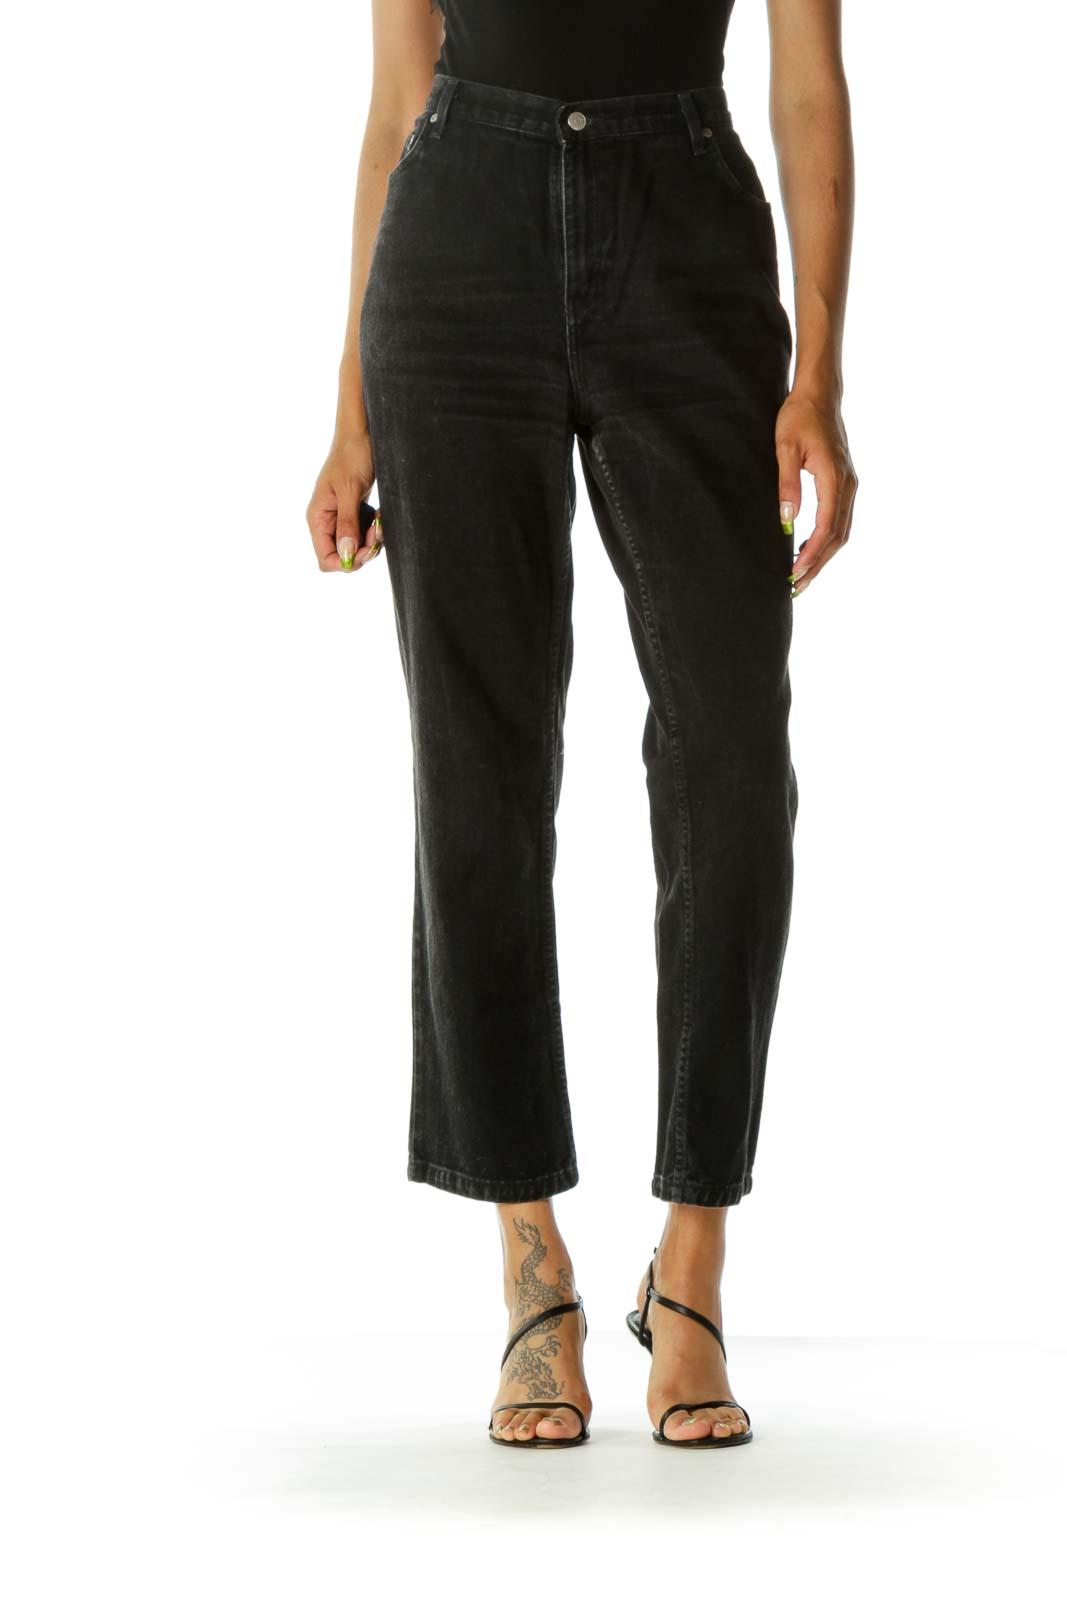 Black Washed 100% Cotton Tapered Denim Jeans Front